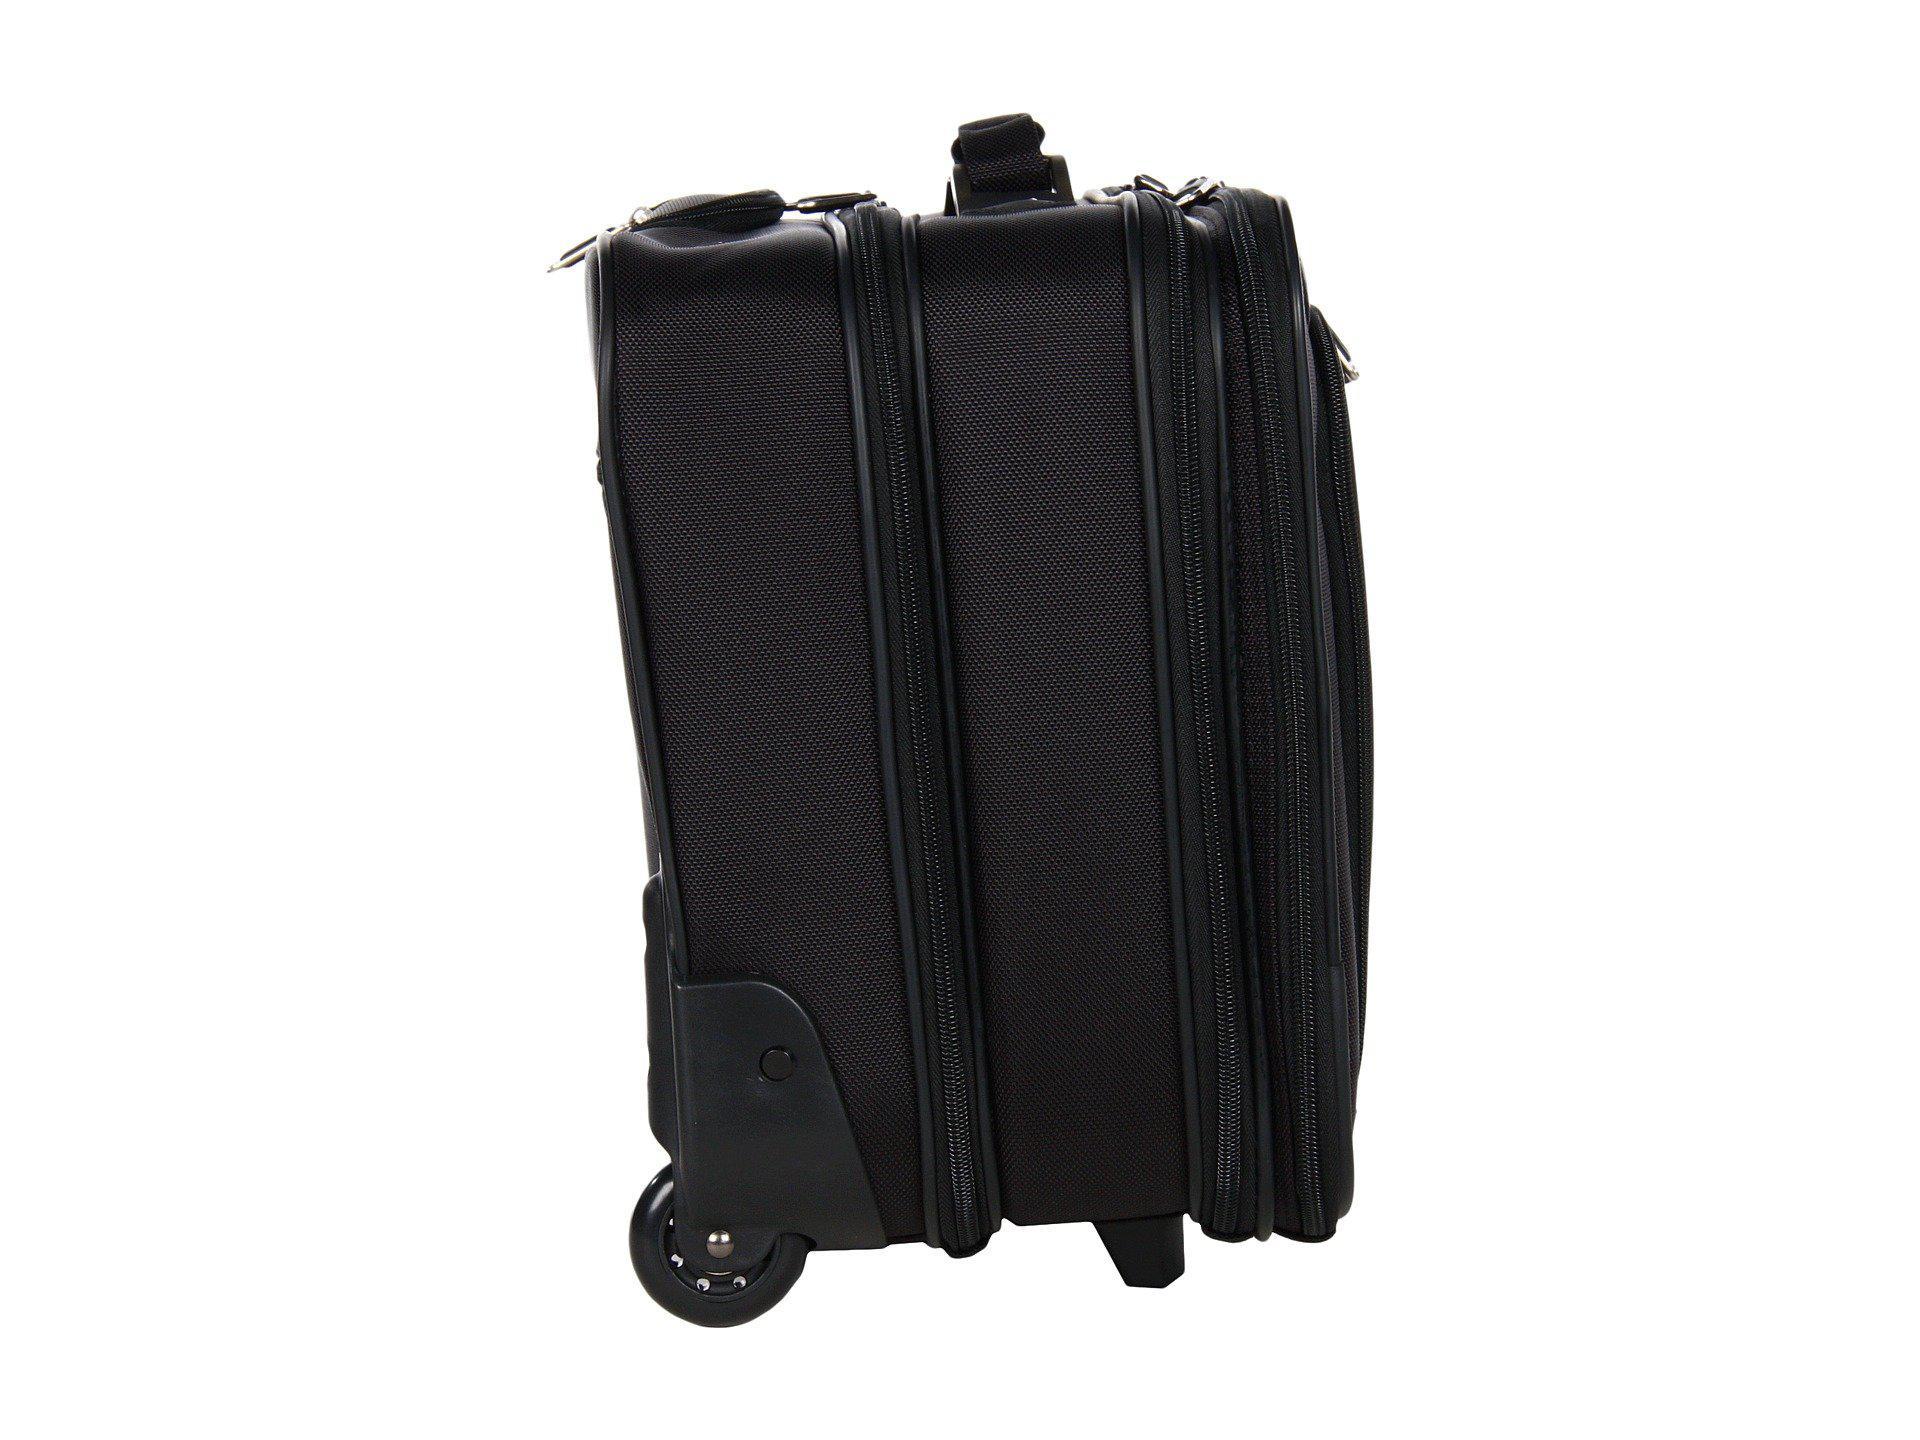 Samsonite - Business One Mobile Office (black) Briefcase Bags - Lyst. View  fullscreen 7a8ff0b04feef